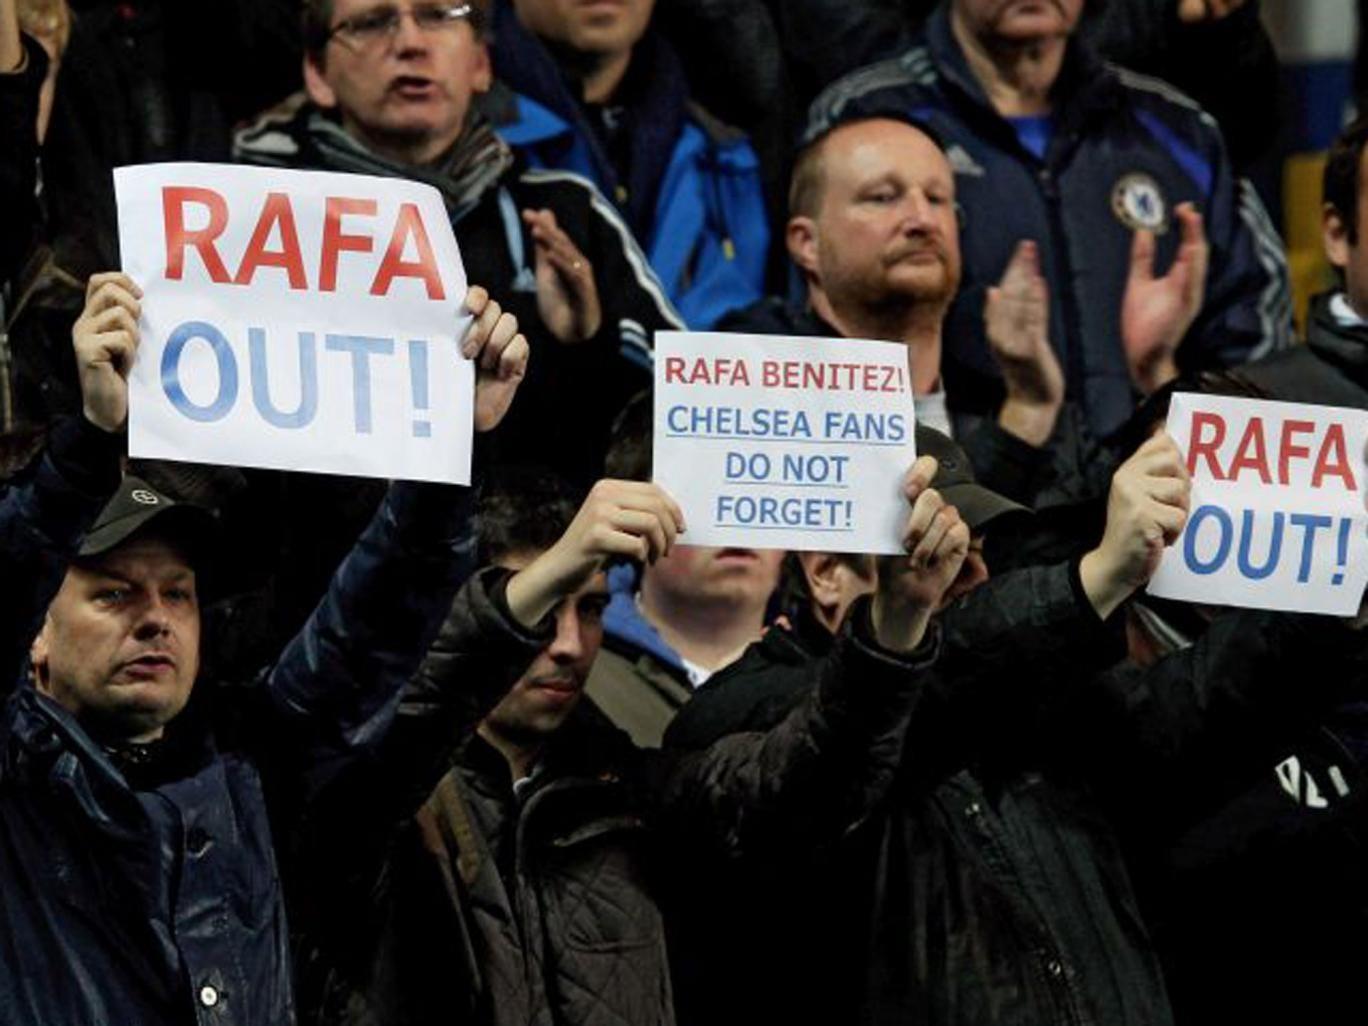 Rafael Benitez received a warm welcome from Chelsea fans last week